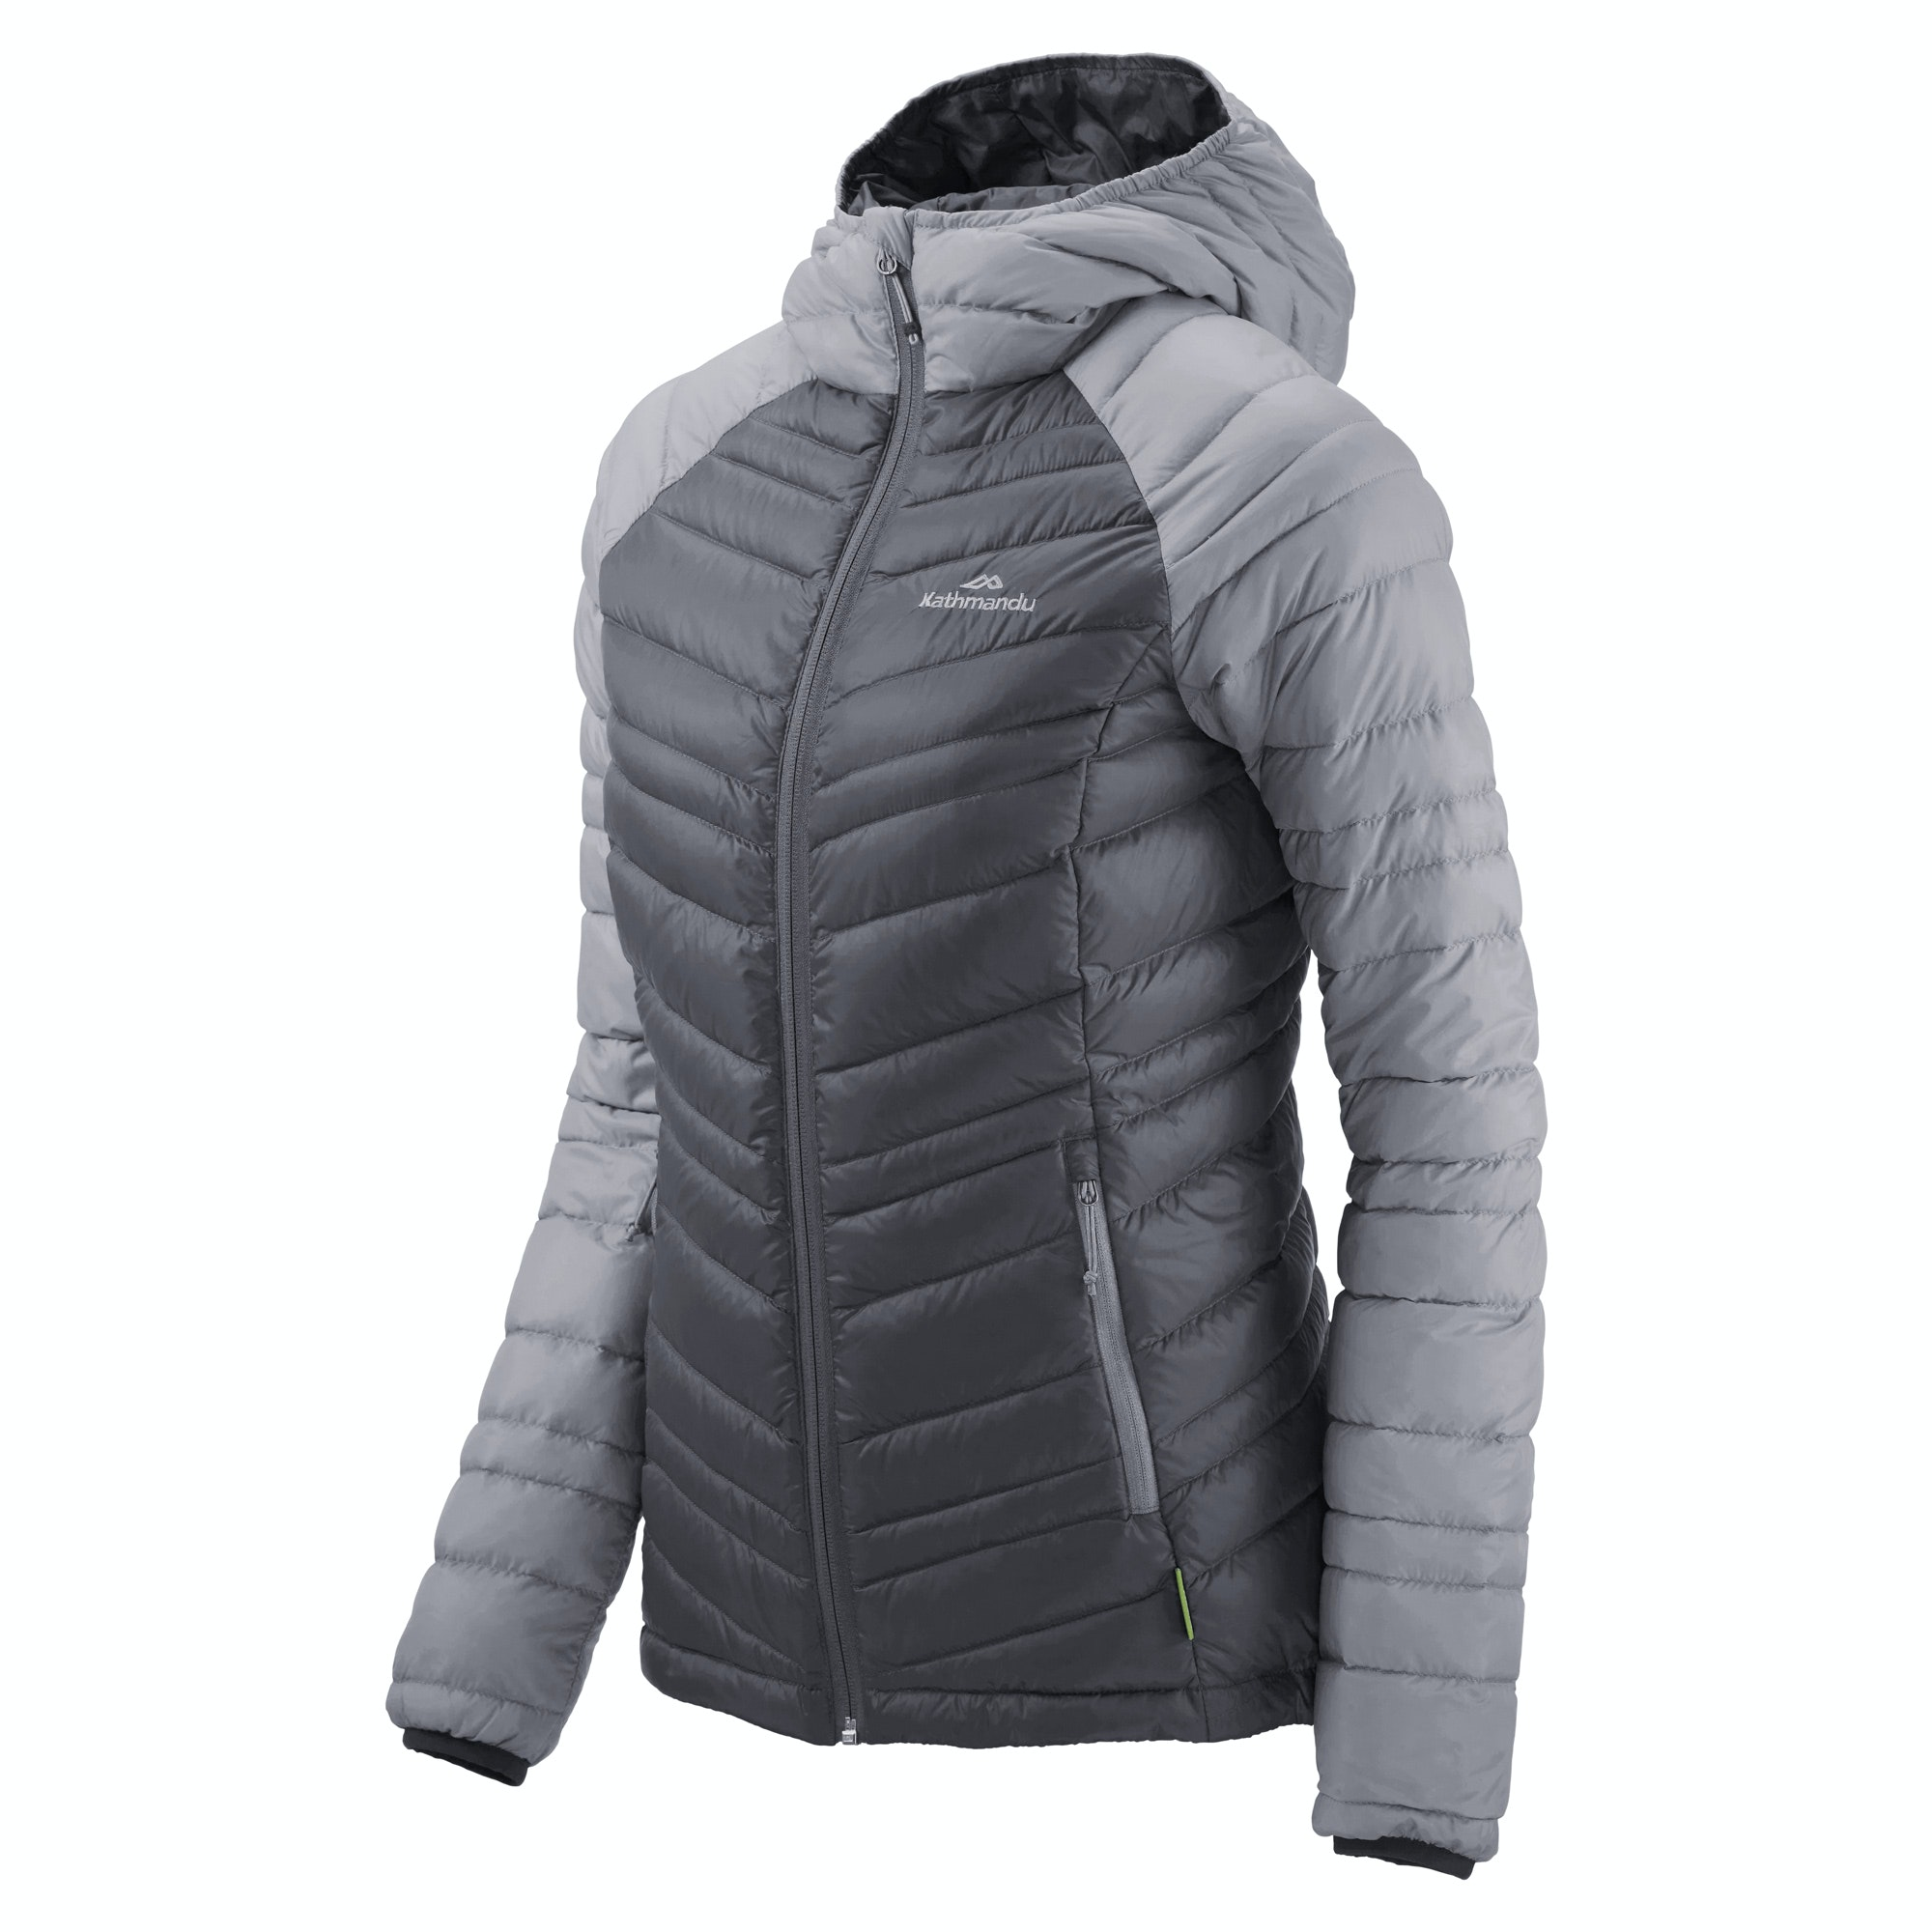 Hooded jacket for women